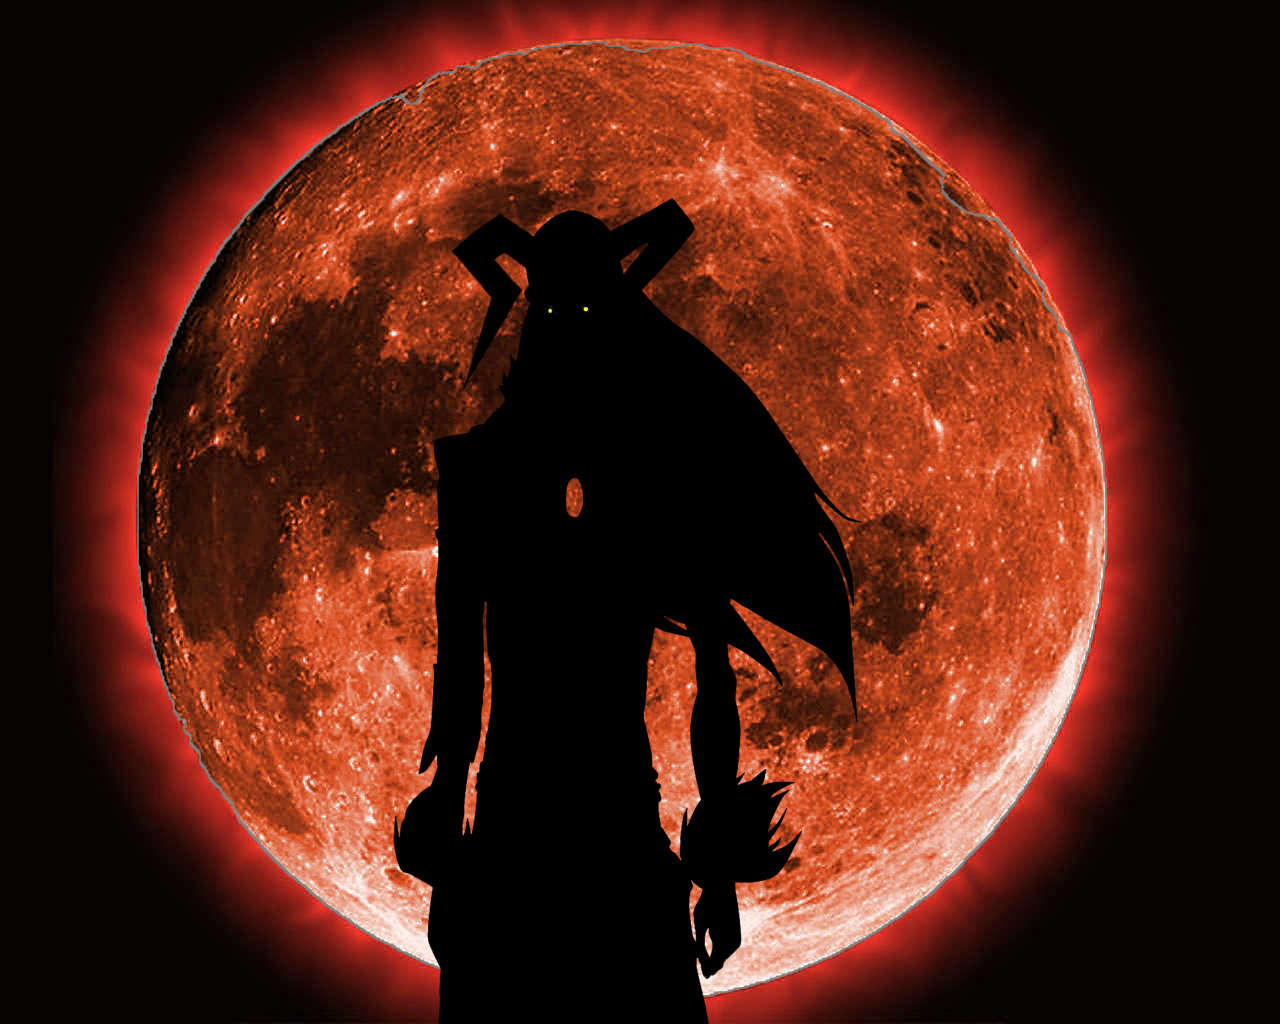 red moon demon - photo #3